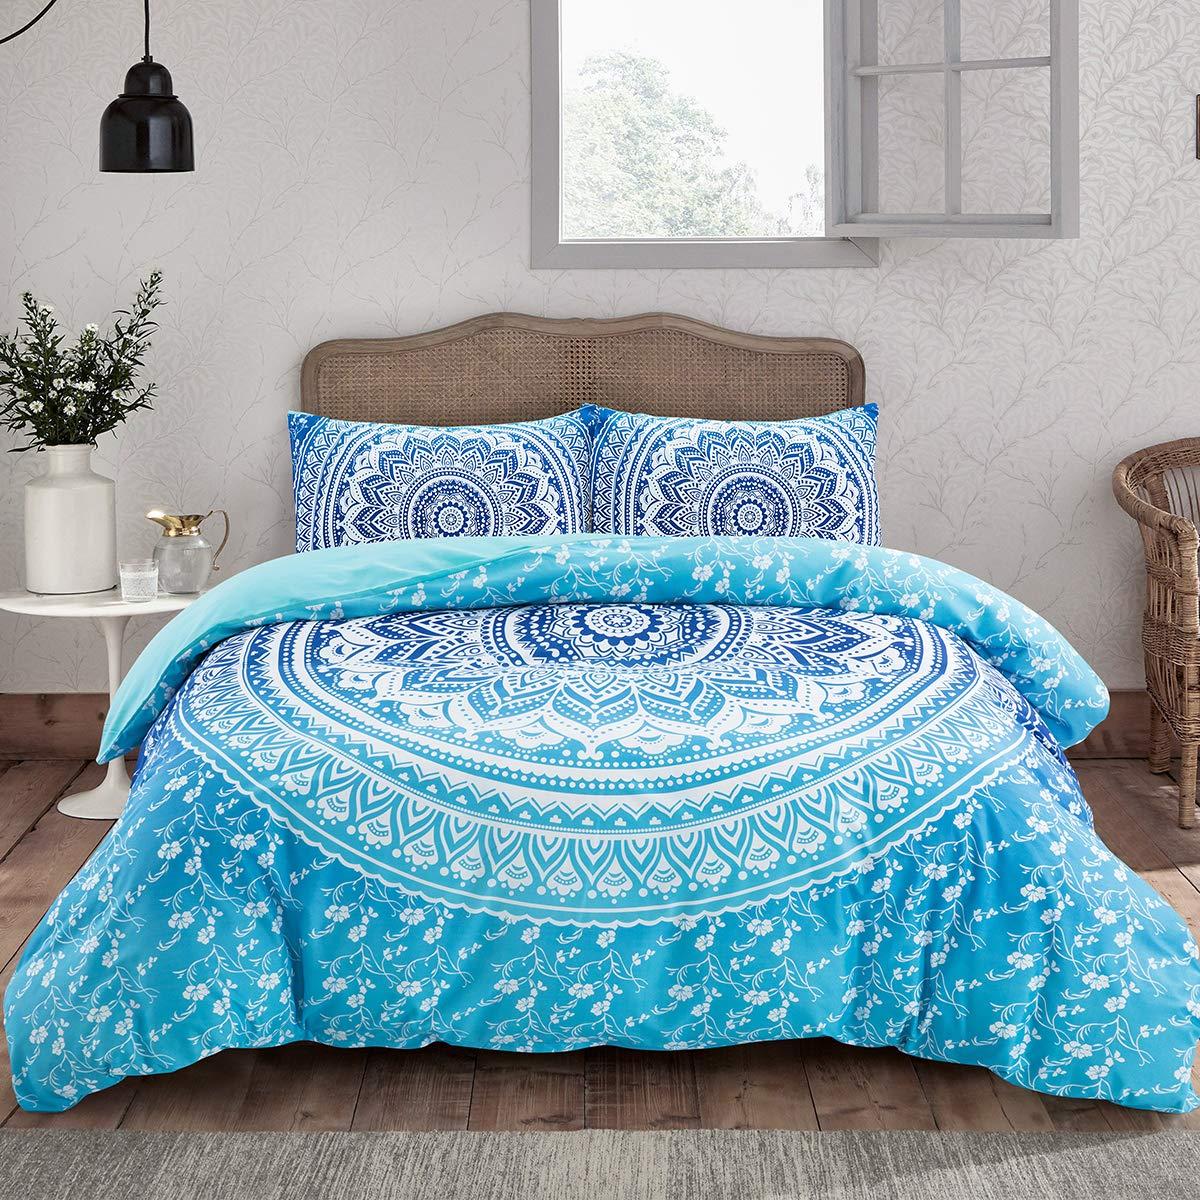 "ARTALL 3 Pcs Soft Microfiber Bohemian Bedding Set Boho Bedding Blue Mandala Hippie Duvet Cover Set Full/Queen Size(90""x90"")"